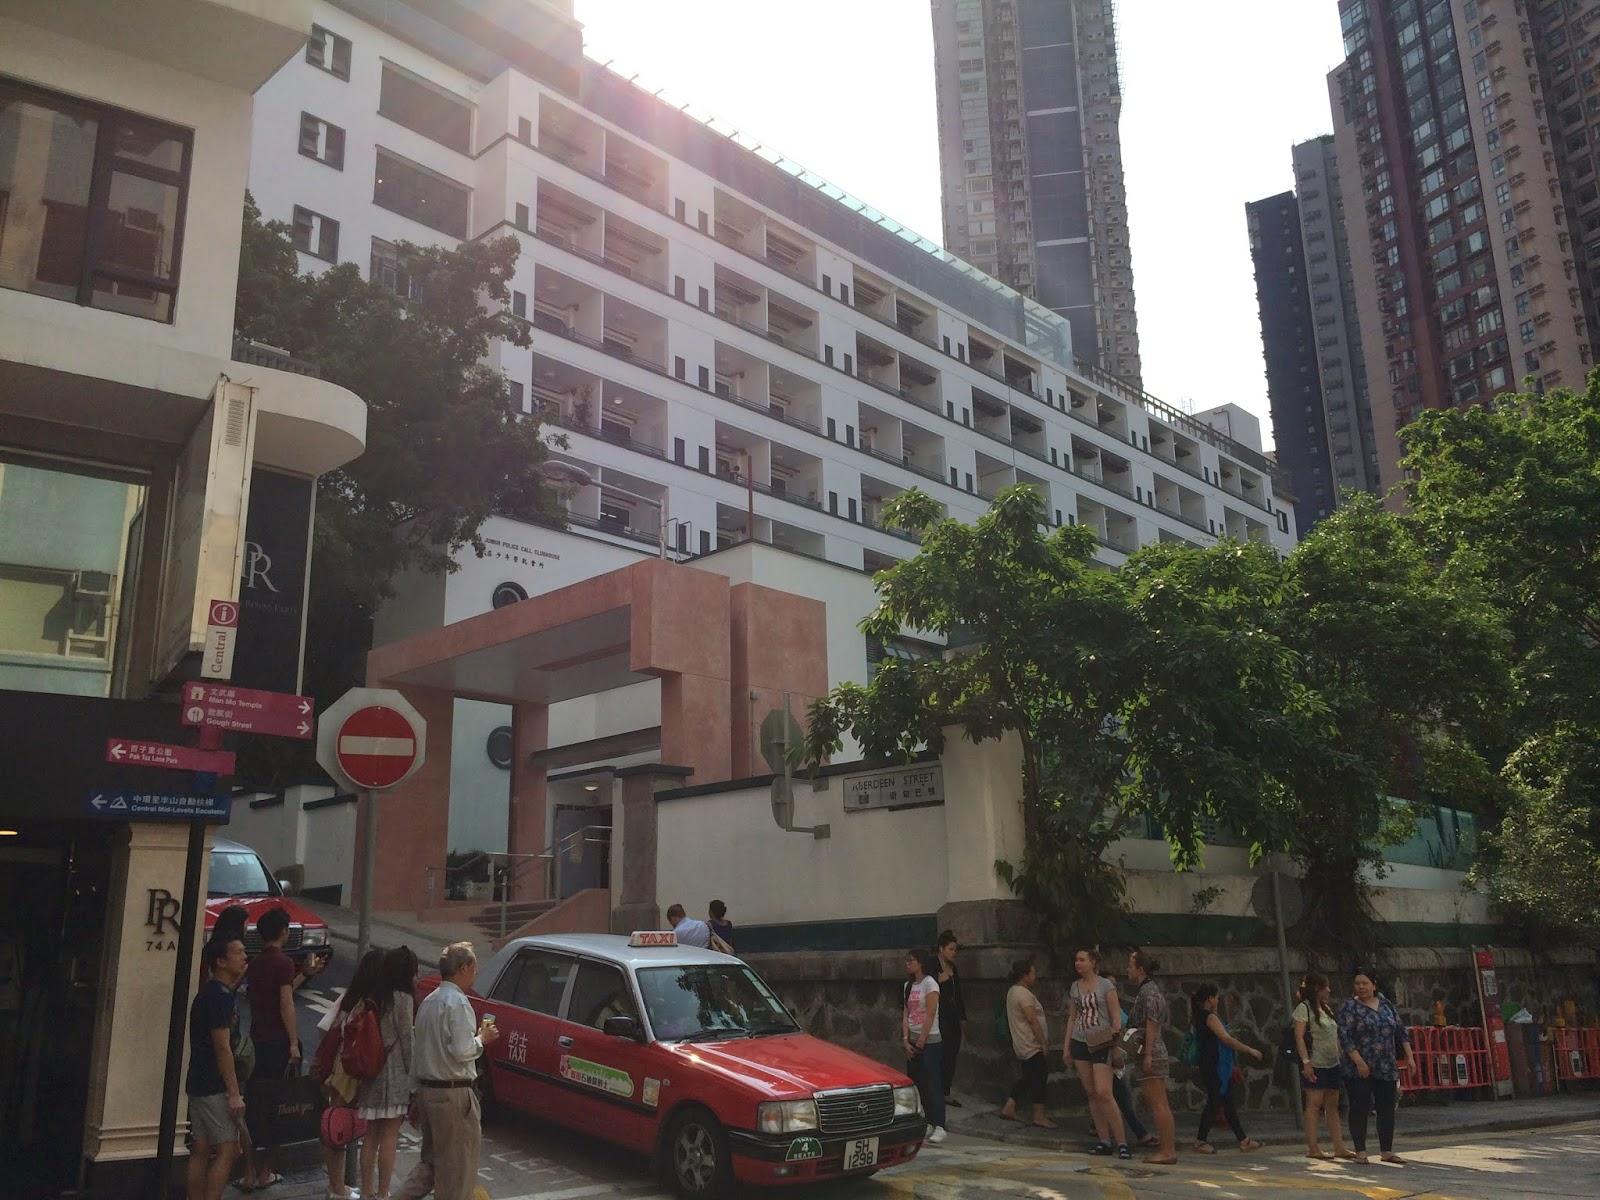 Old my Blog: [香港]PMQ元創方(活化歷史建築)